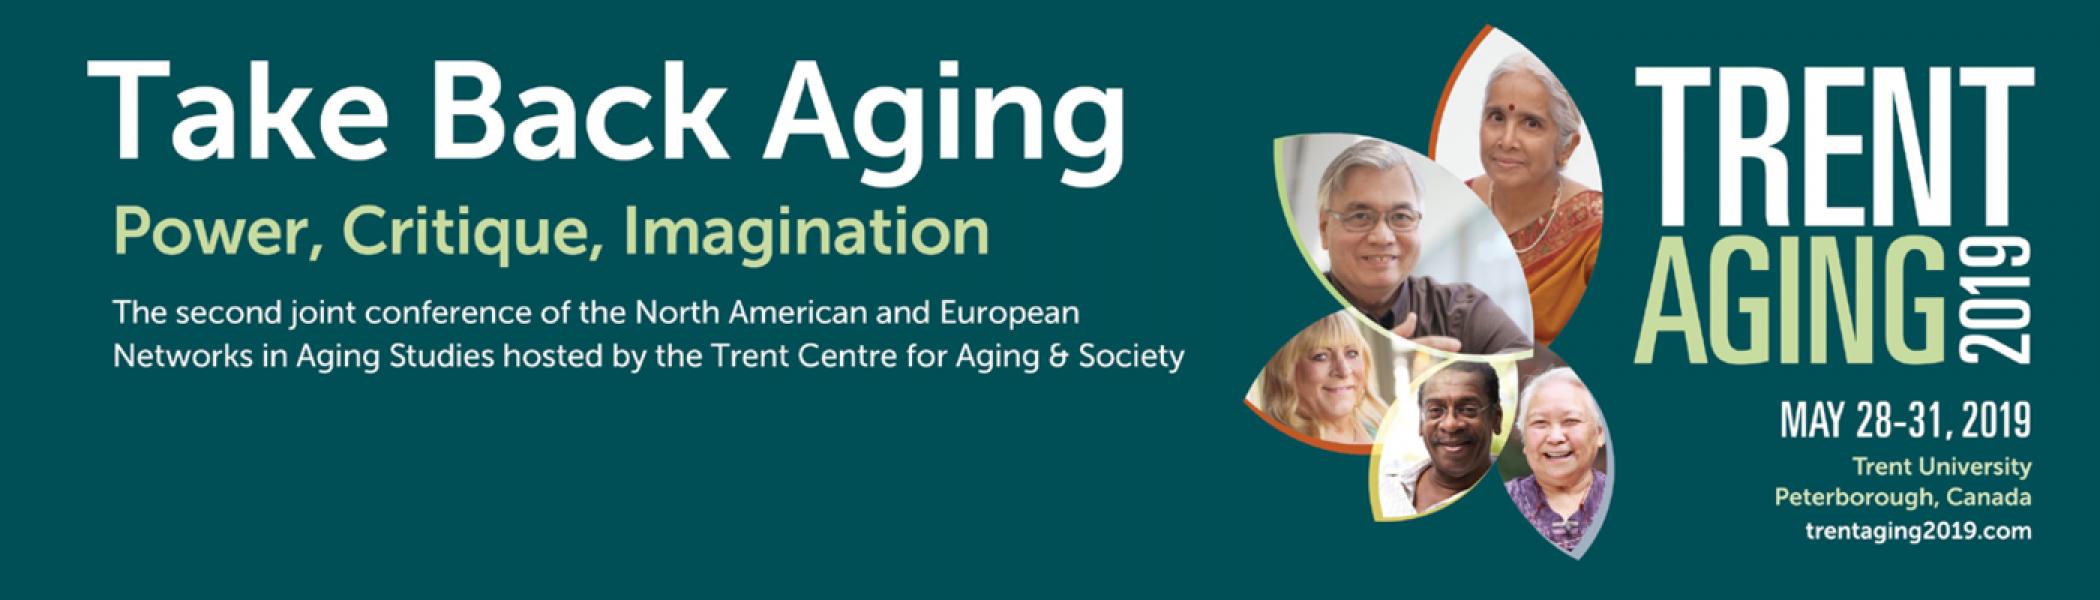 Take Back Aging Web Banner